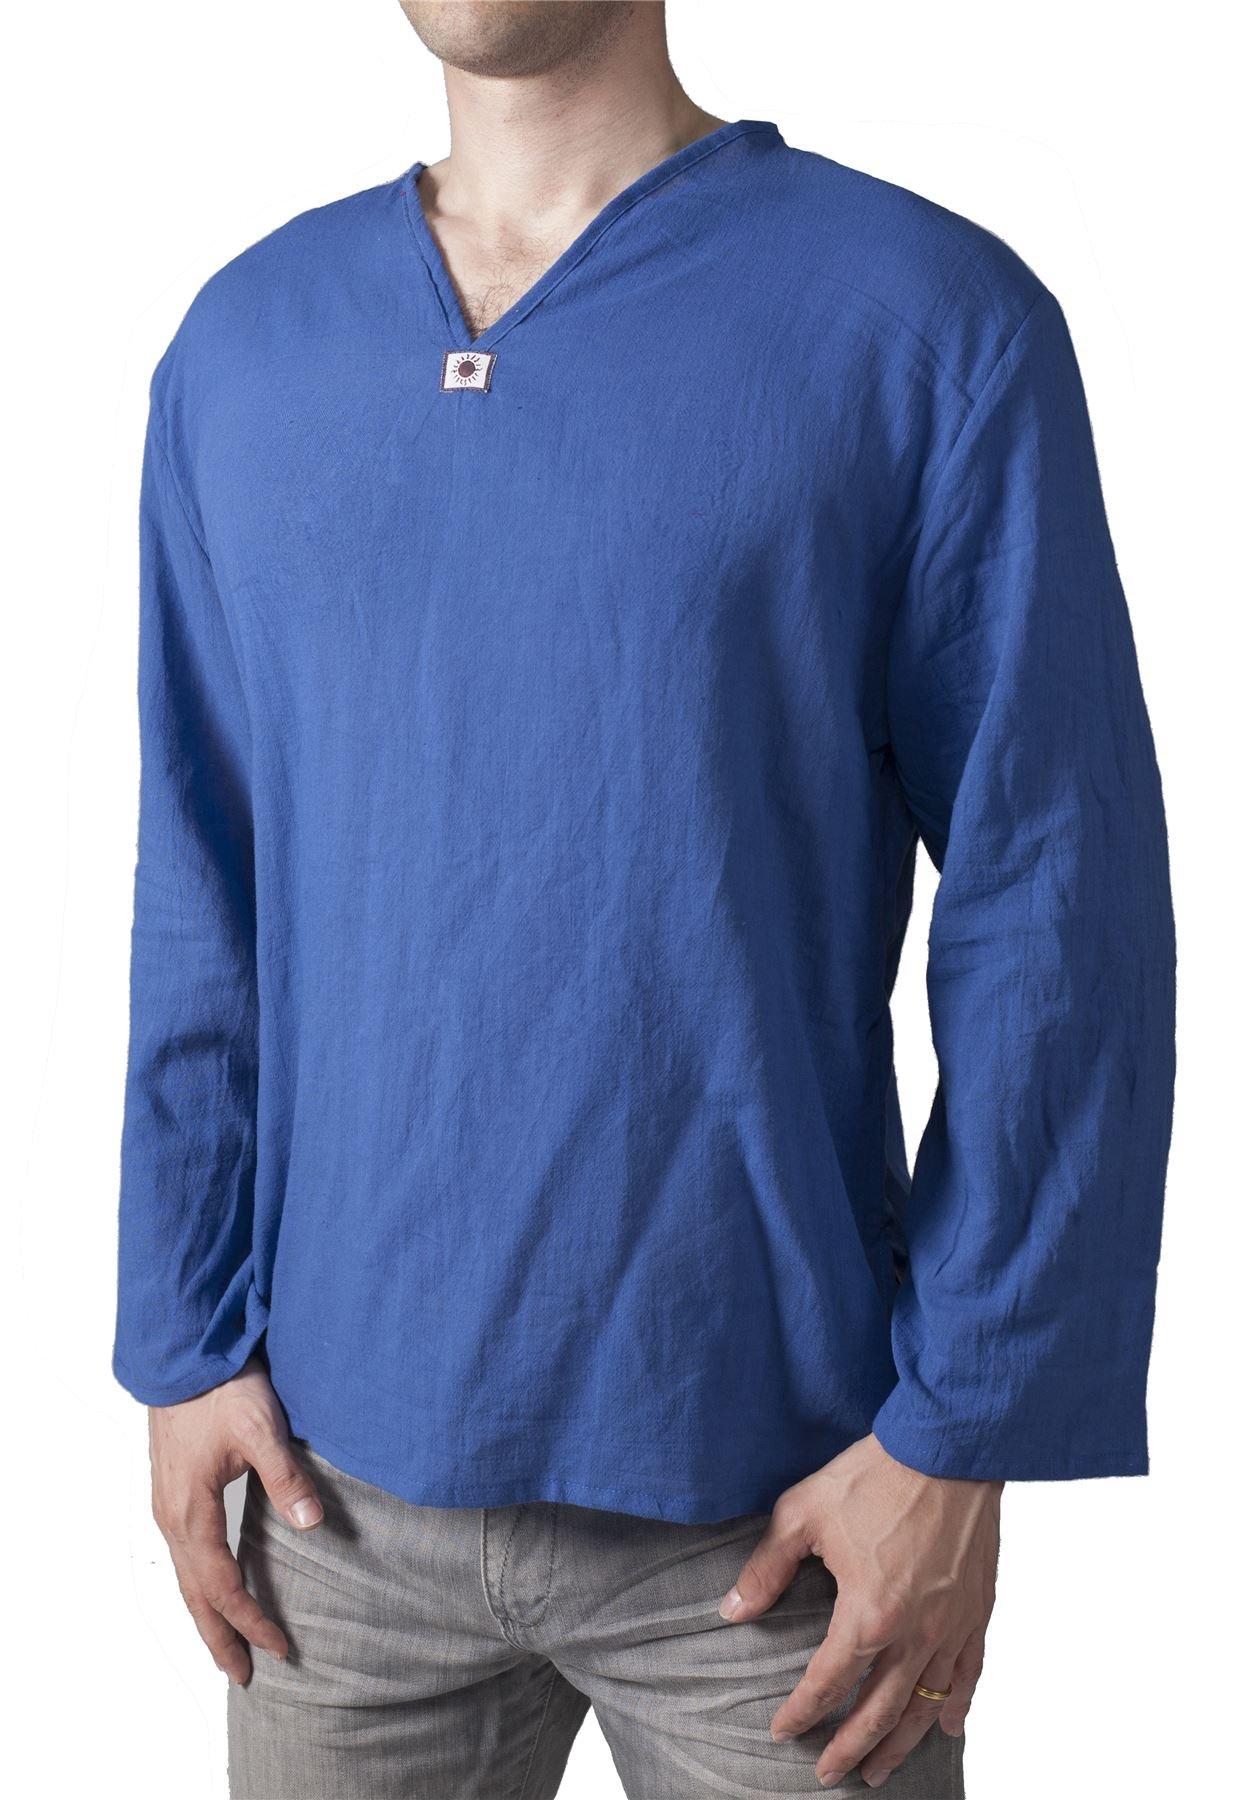 Lofbaz Men's V-Neck T-Shirt 100% Cotton Thai Hippie Shirt Yoga Top Dark Blue XL